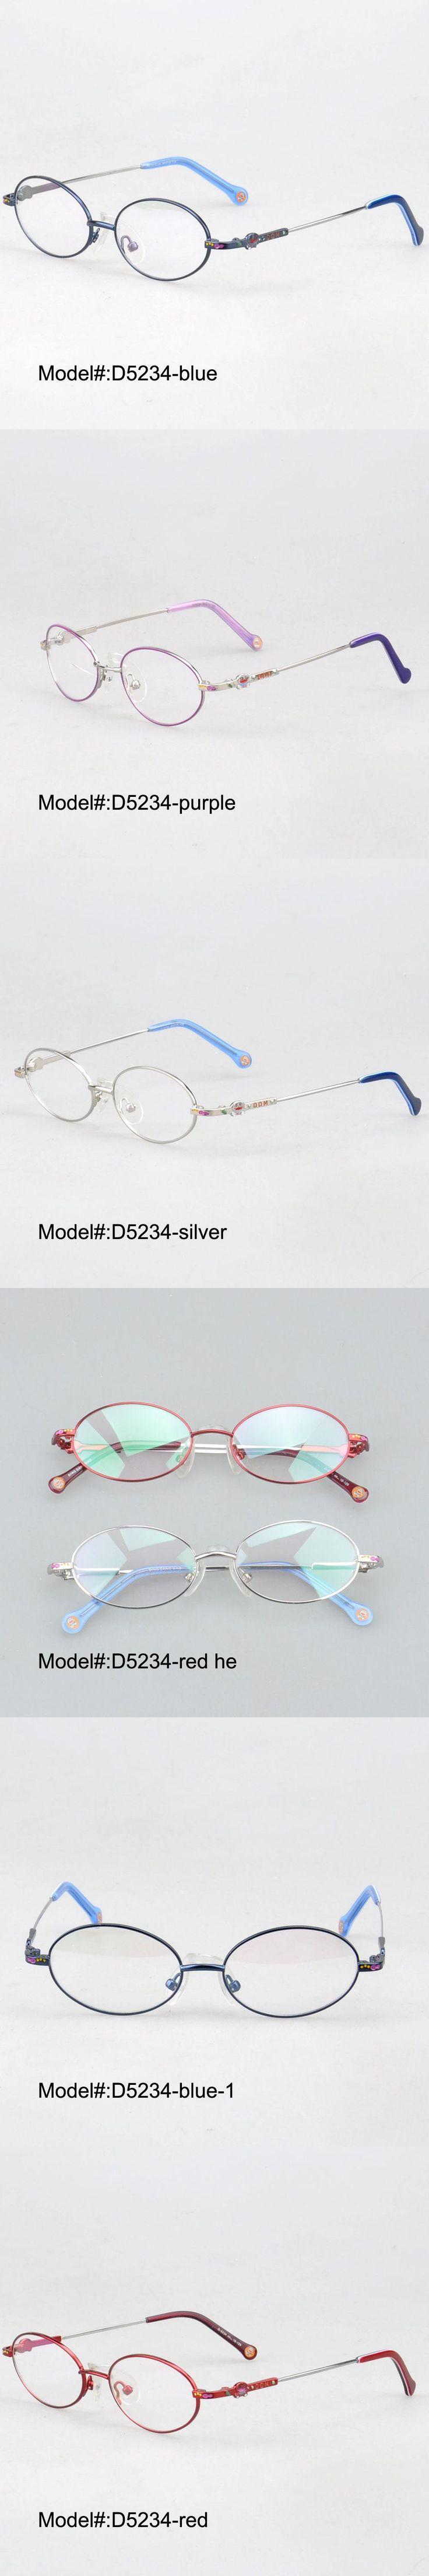 MY DOLI 5234 Colorful cute full rim metal children's eyeglasses optical eyewear frames myopia spectacles glasses